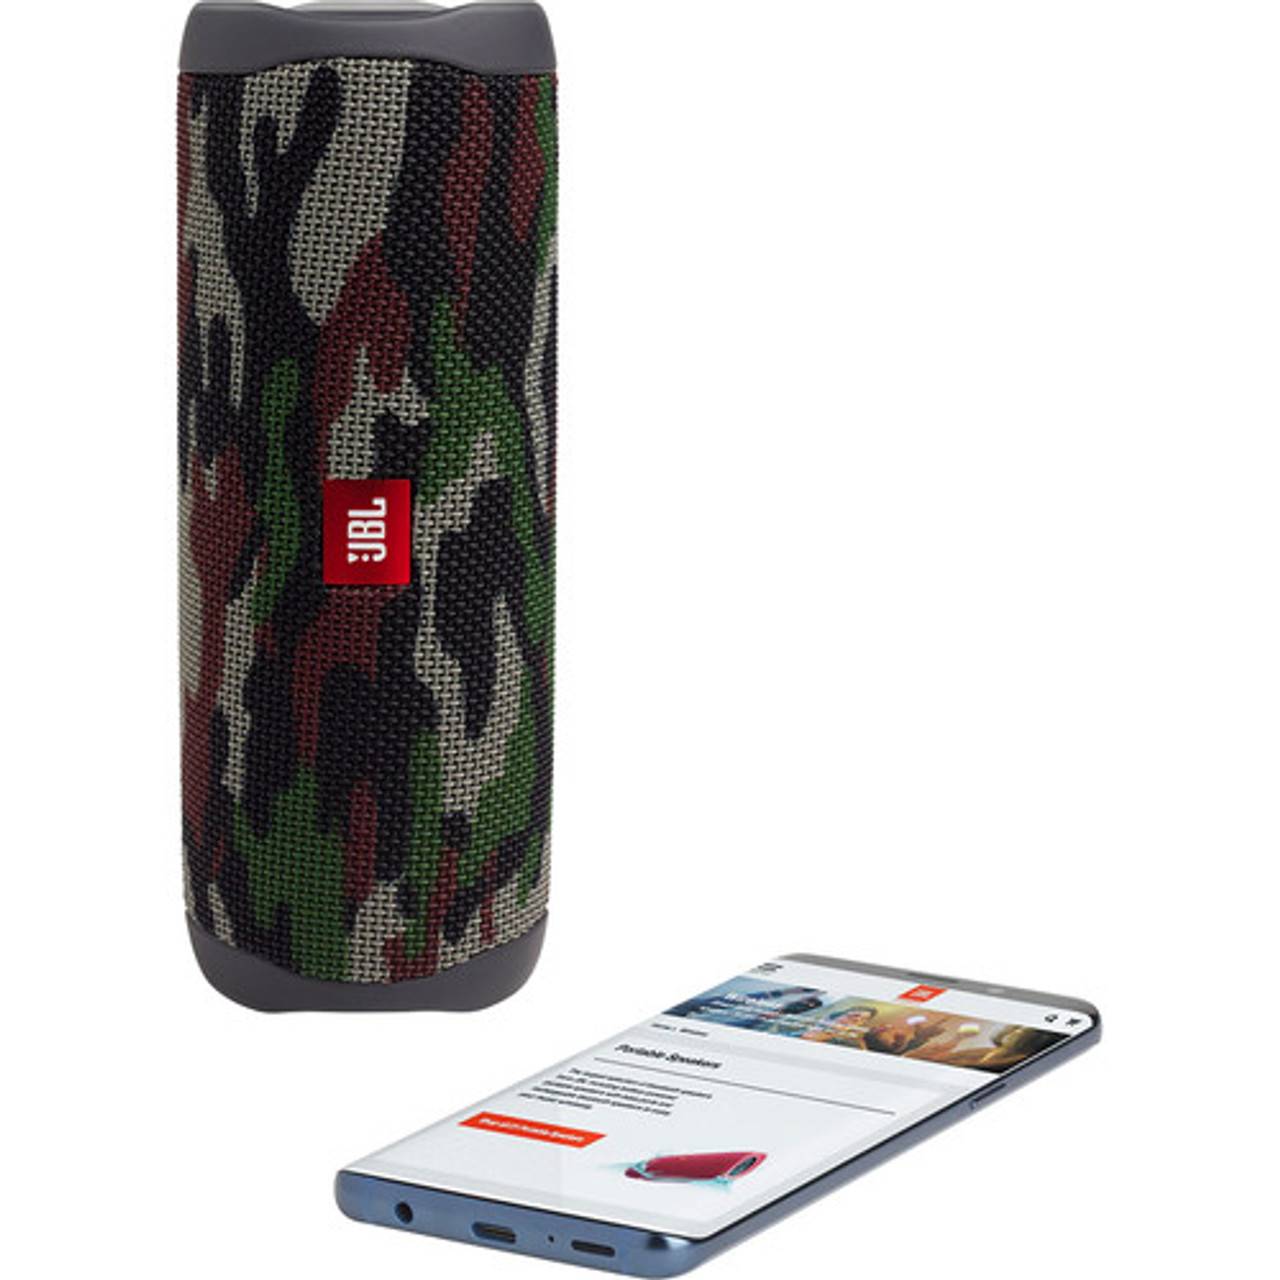 JBL JBLFLIP5SQUADAM-Z FLIP 5 Waterproof Speaker Camo - Certified Refurbished